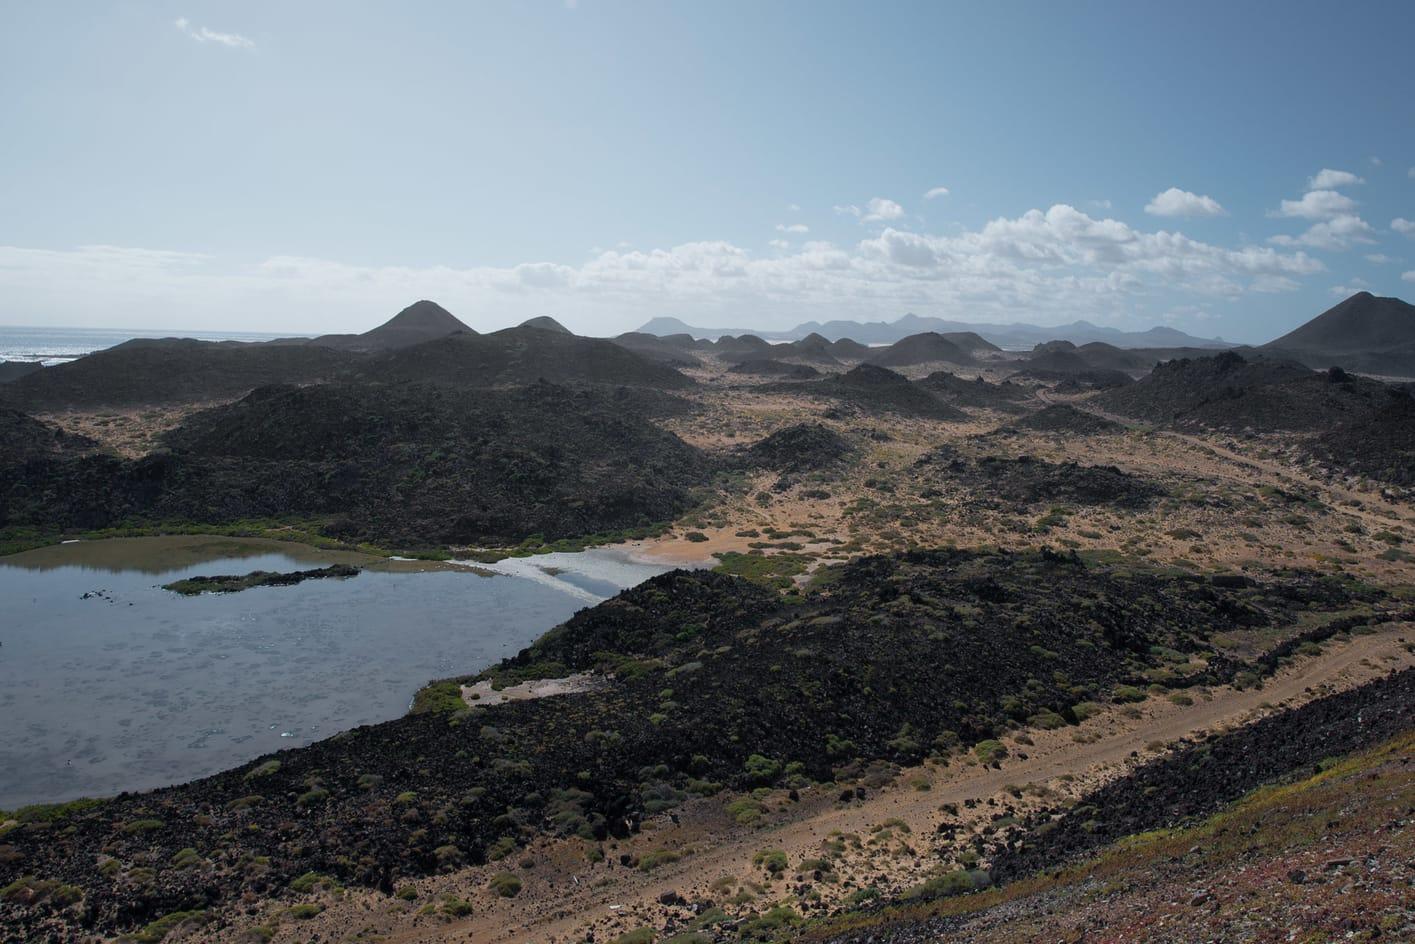 Las Lagunitas, a place to visit in Lobos Island, Canary Islands